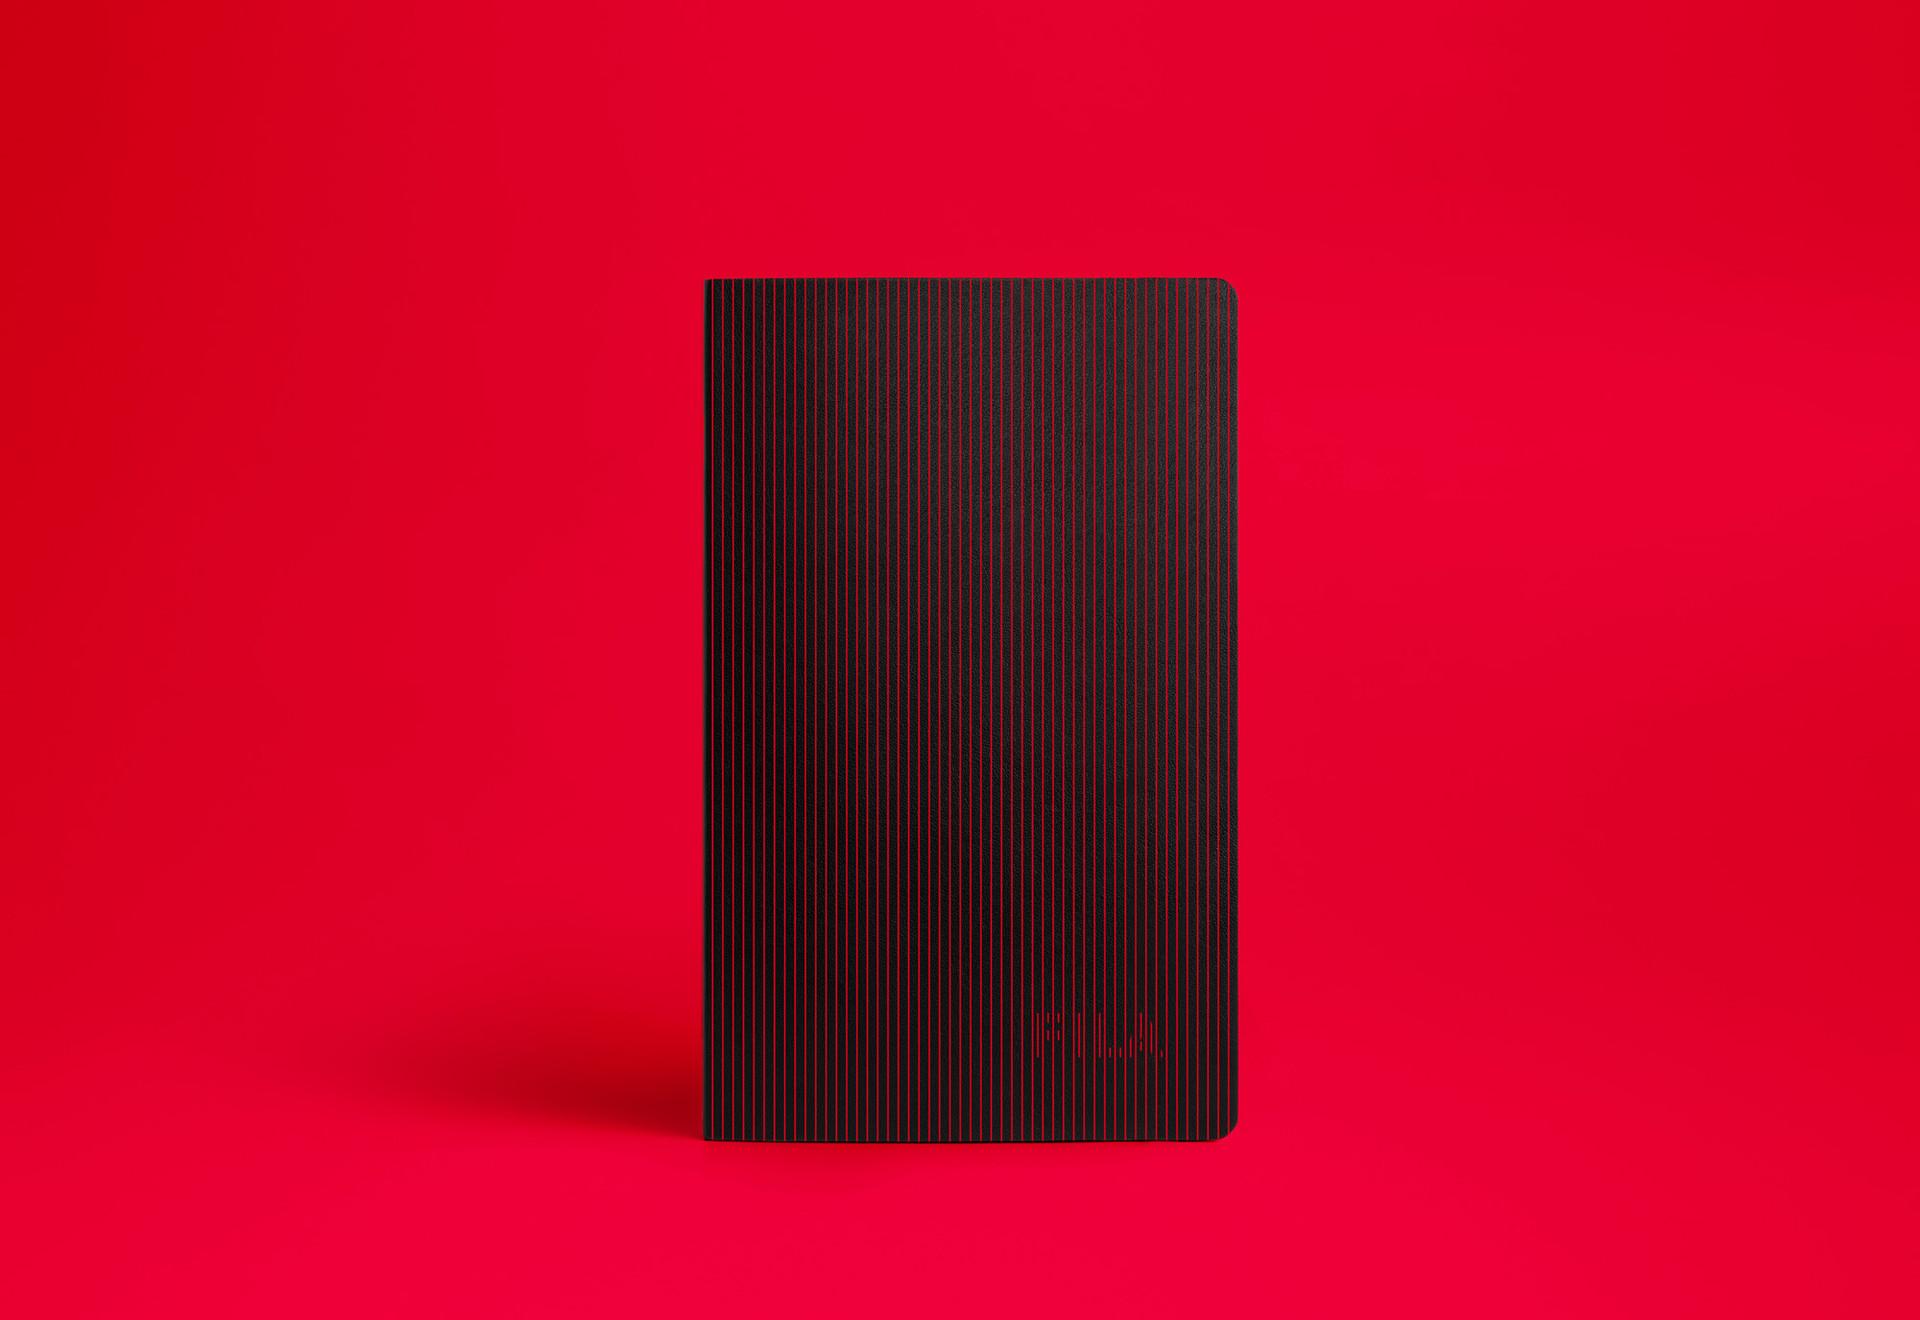 Fila - NoteBook 1.jpg